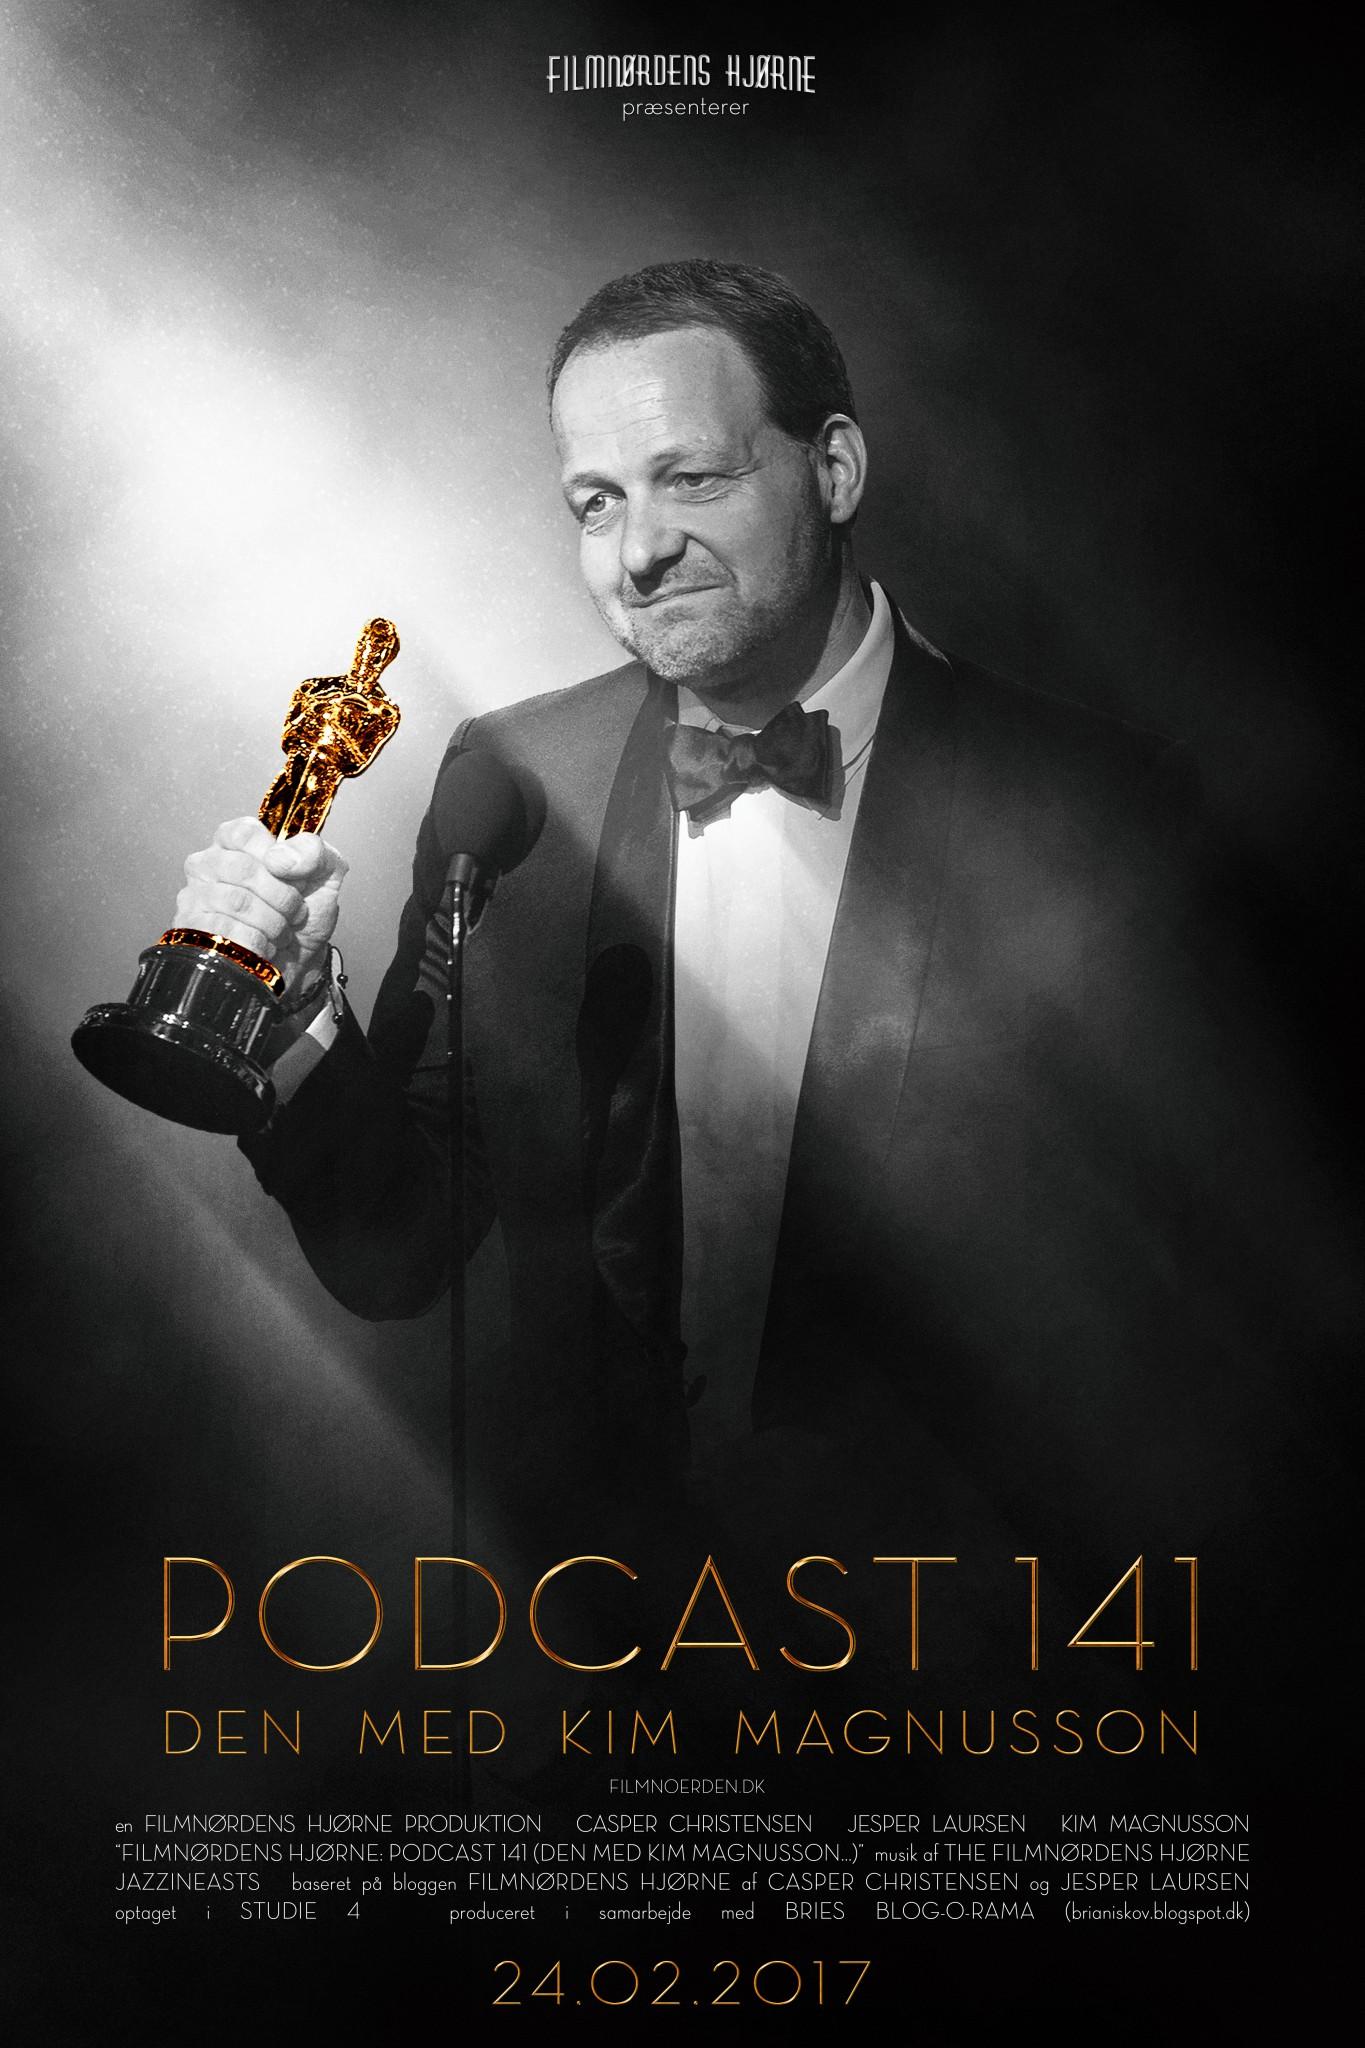 Podcast 141